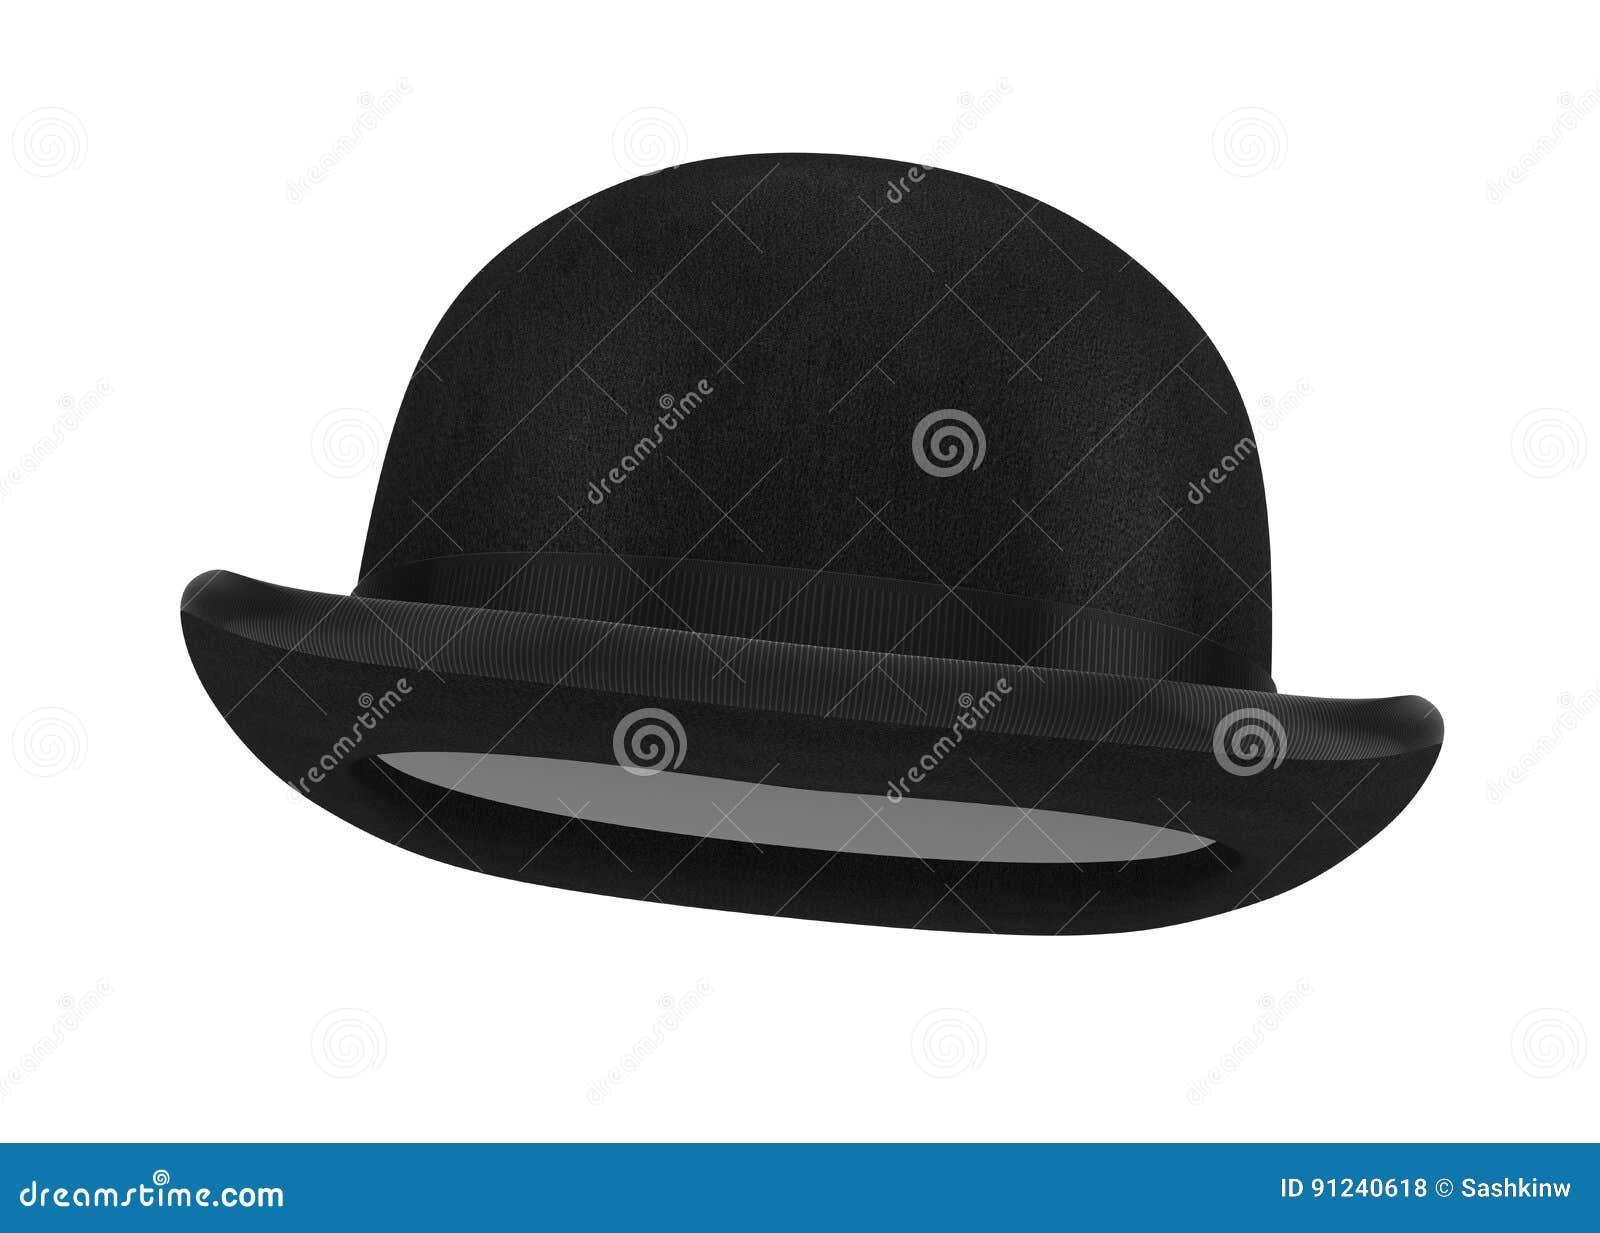 b664821f783 Stylish Black Bowler Hat On A White Background Stock Illustration ...